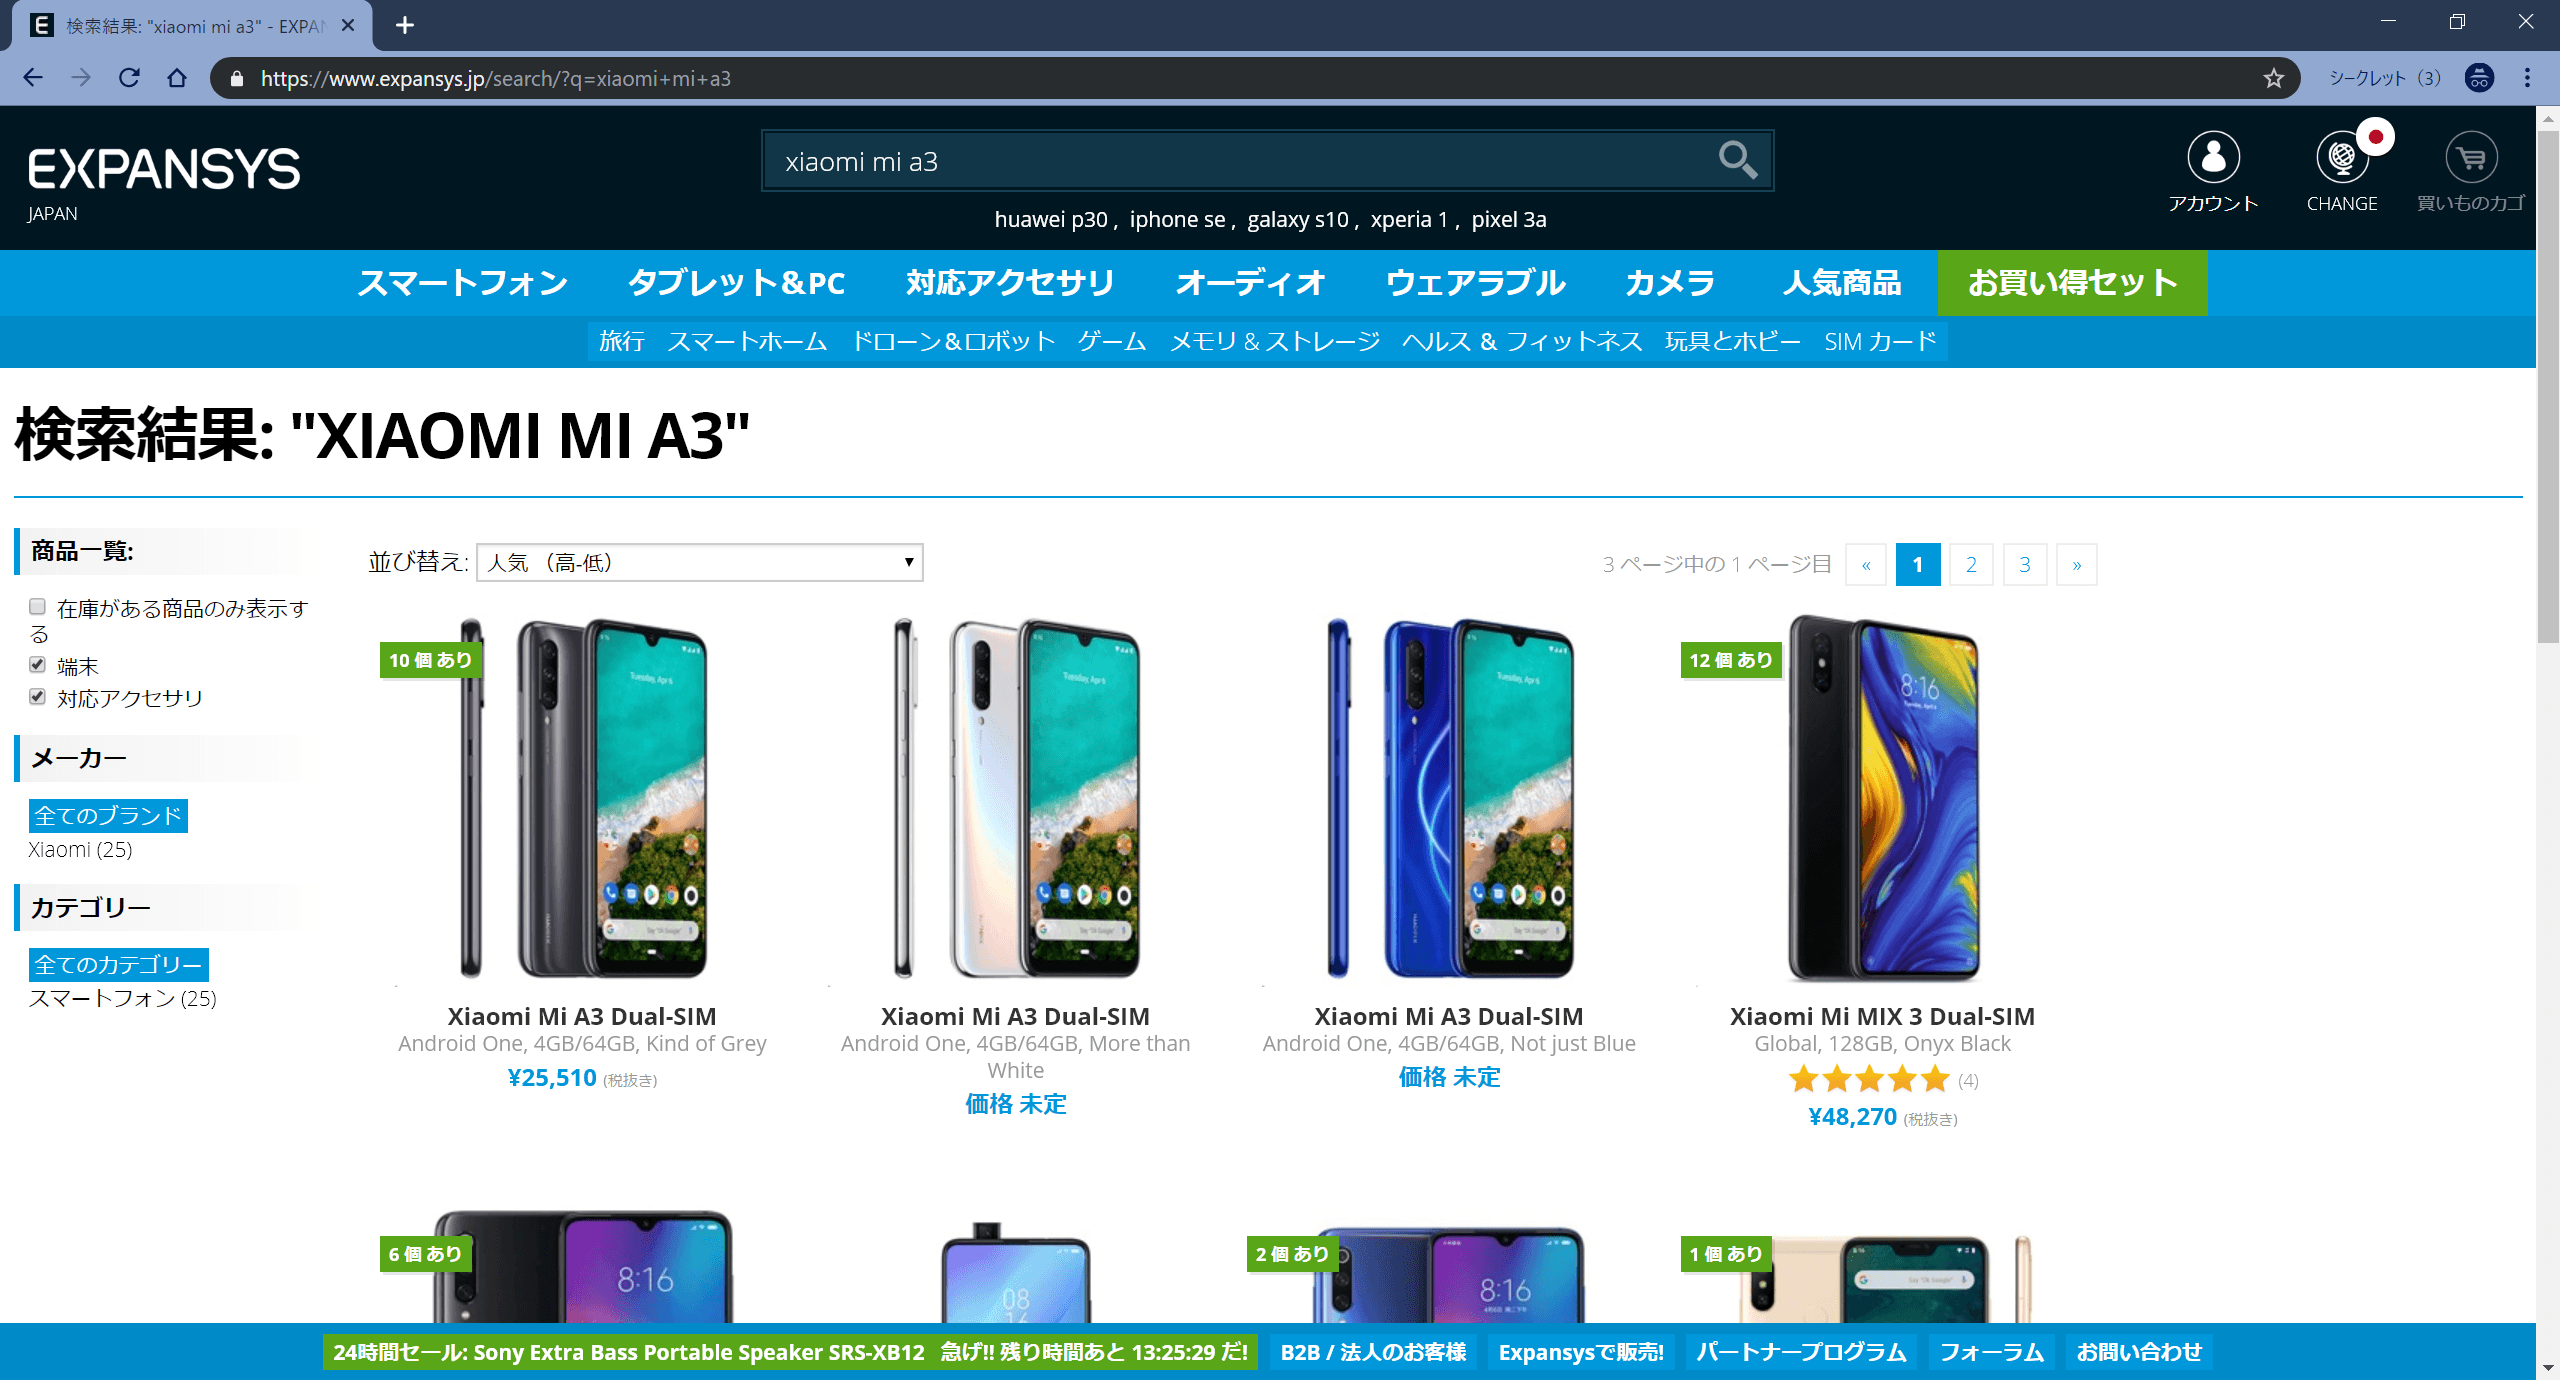 EXPANSYS Xiaomi Mi A3 20190719